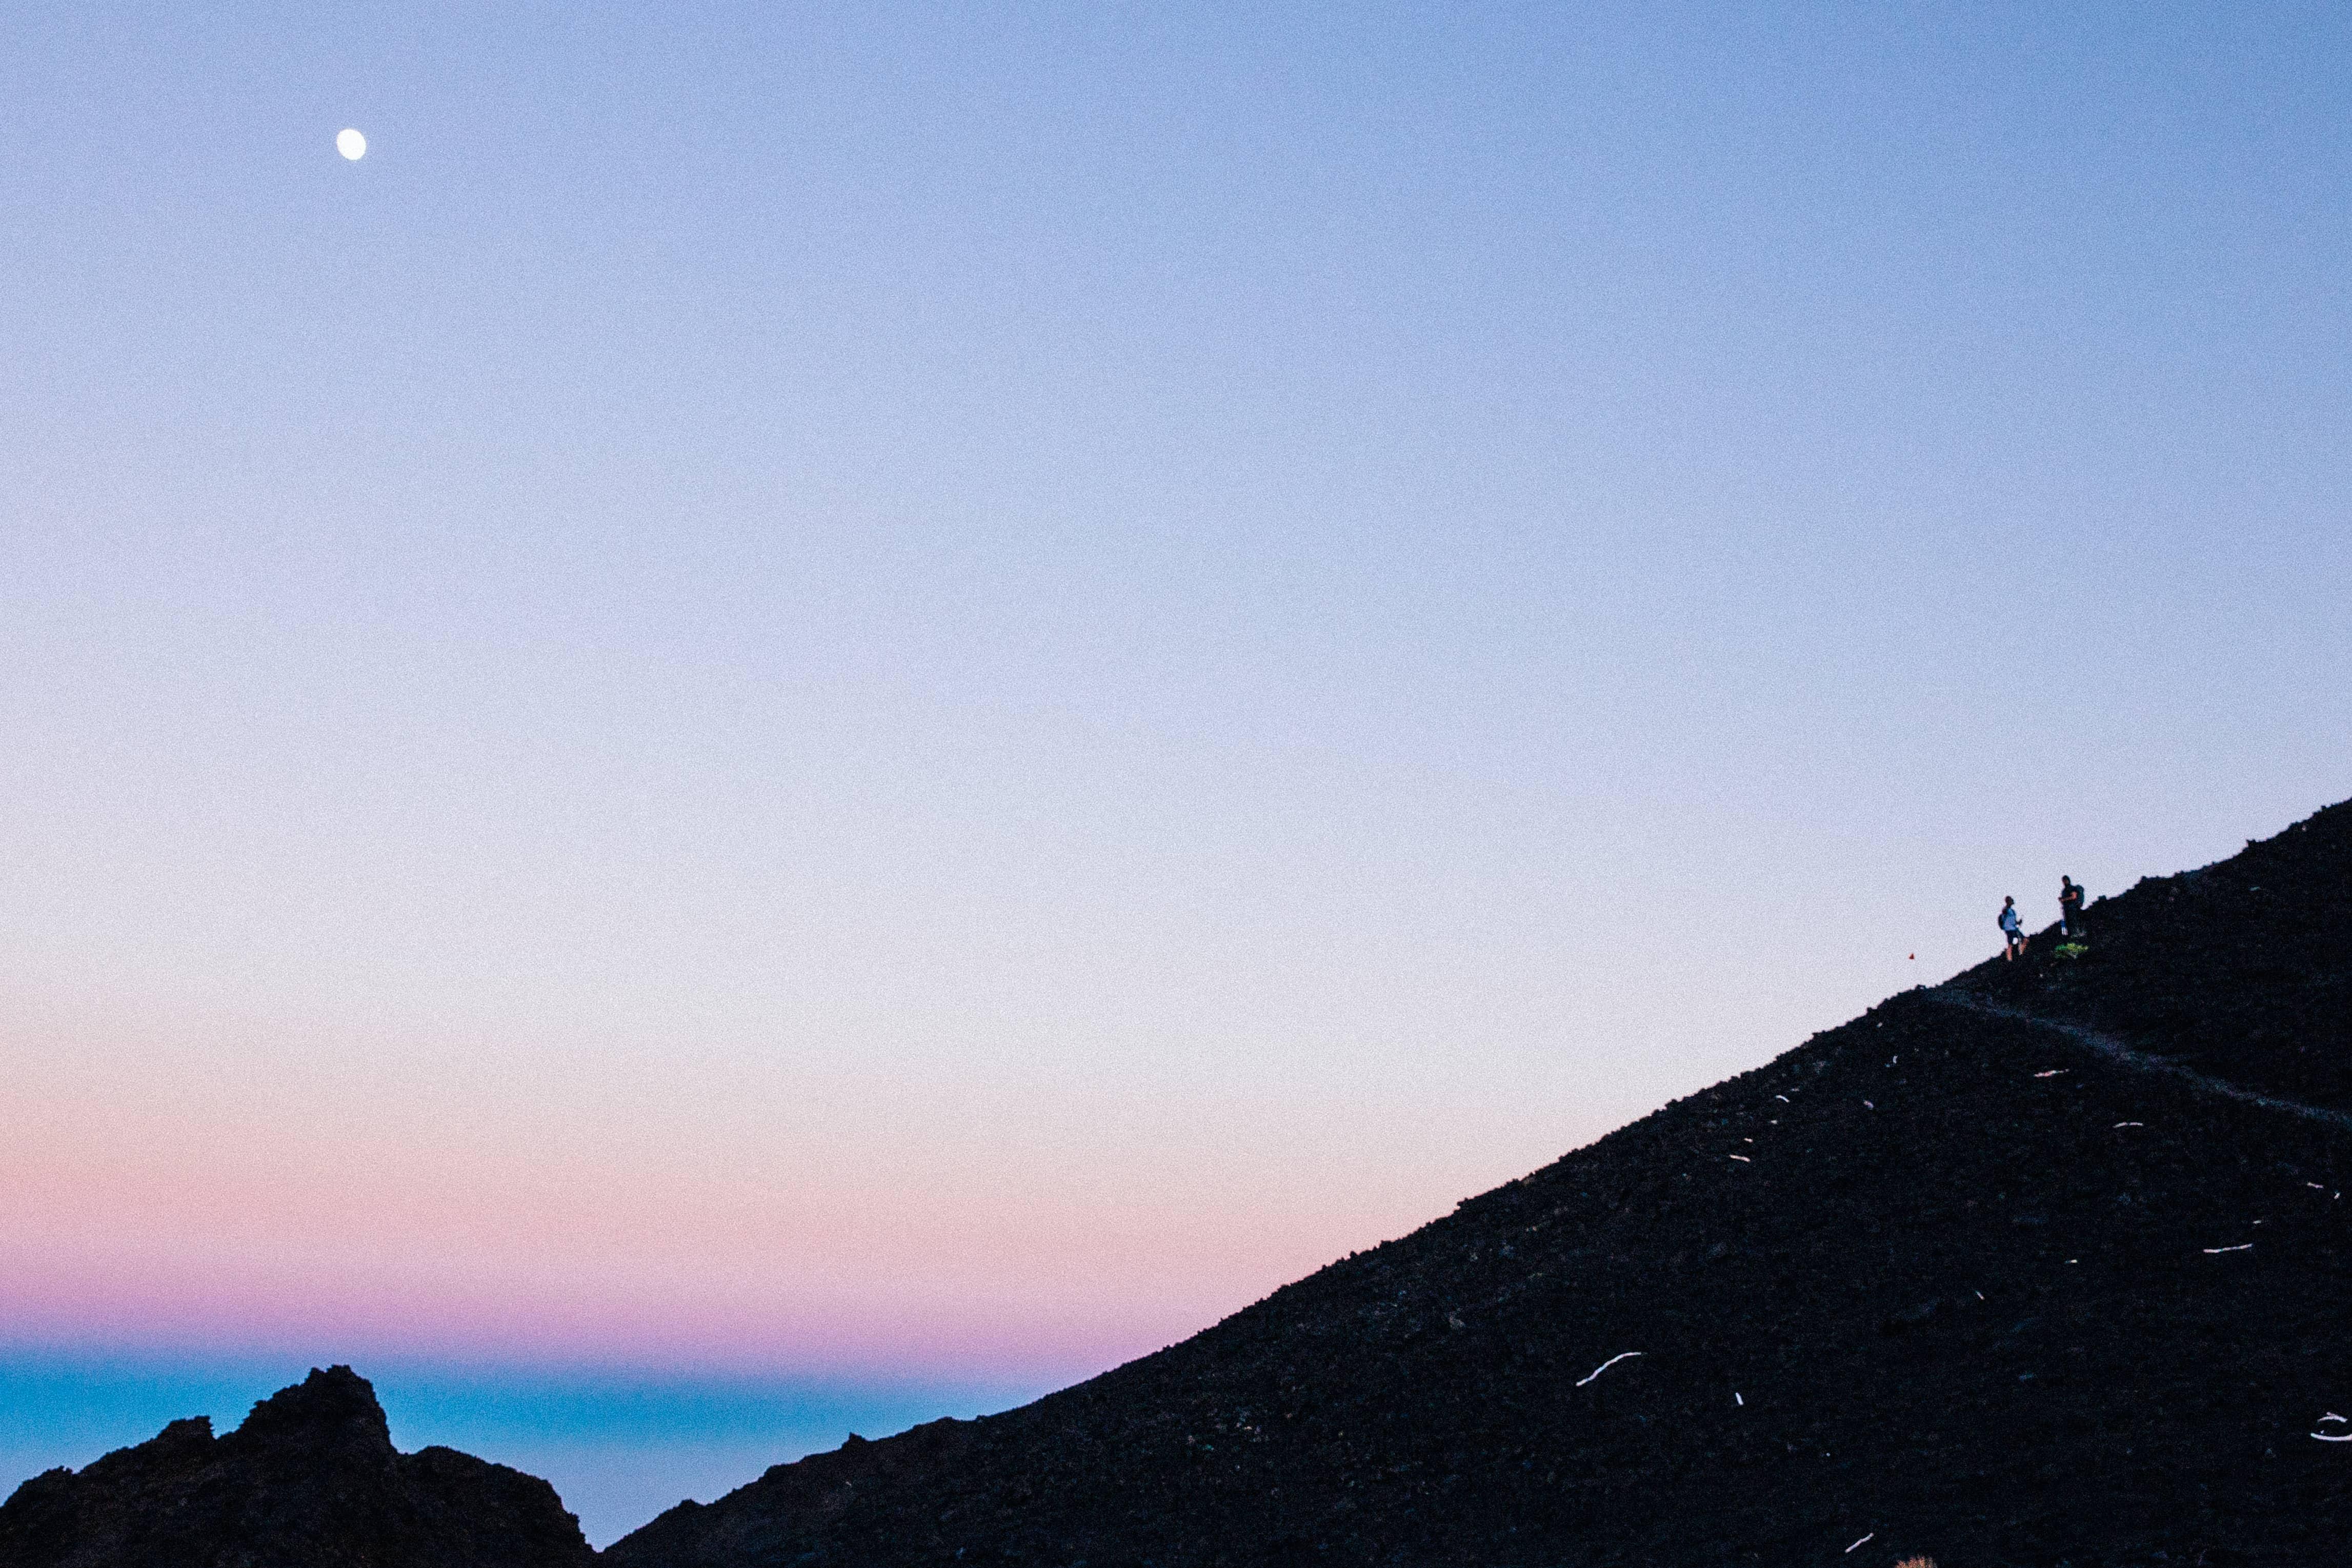 Daniel Sammut - Mount Etna